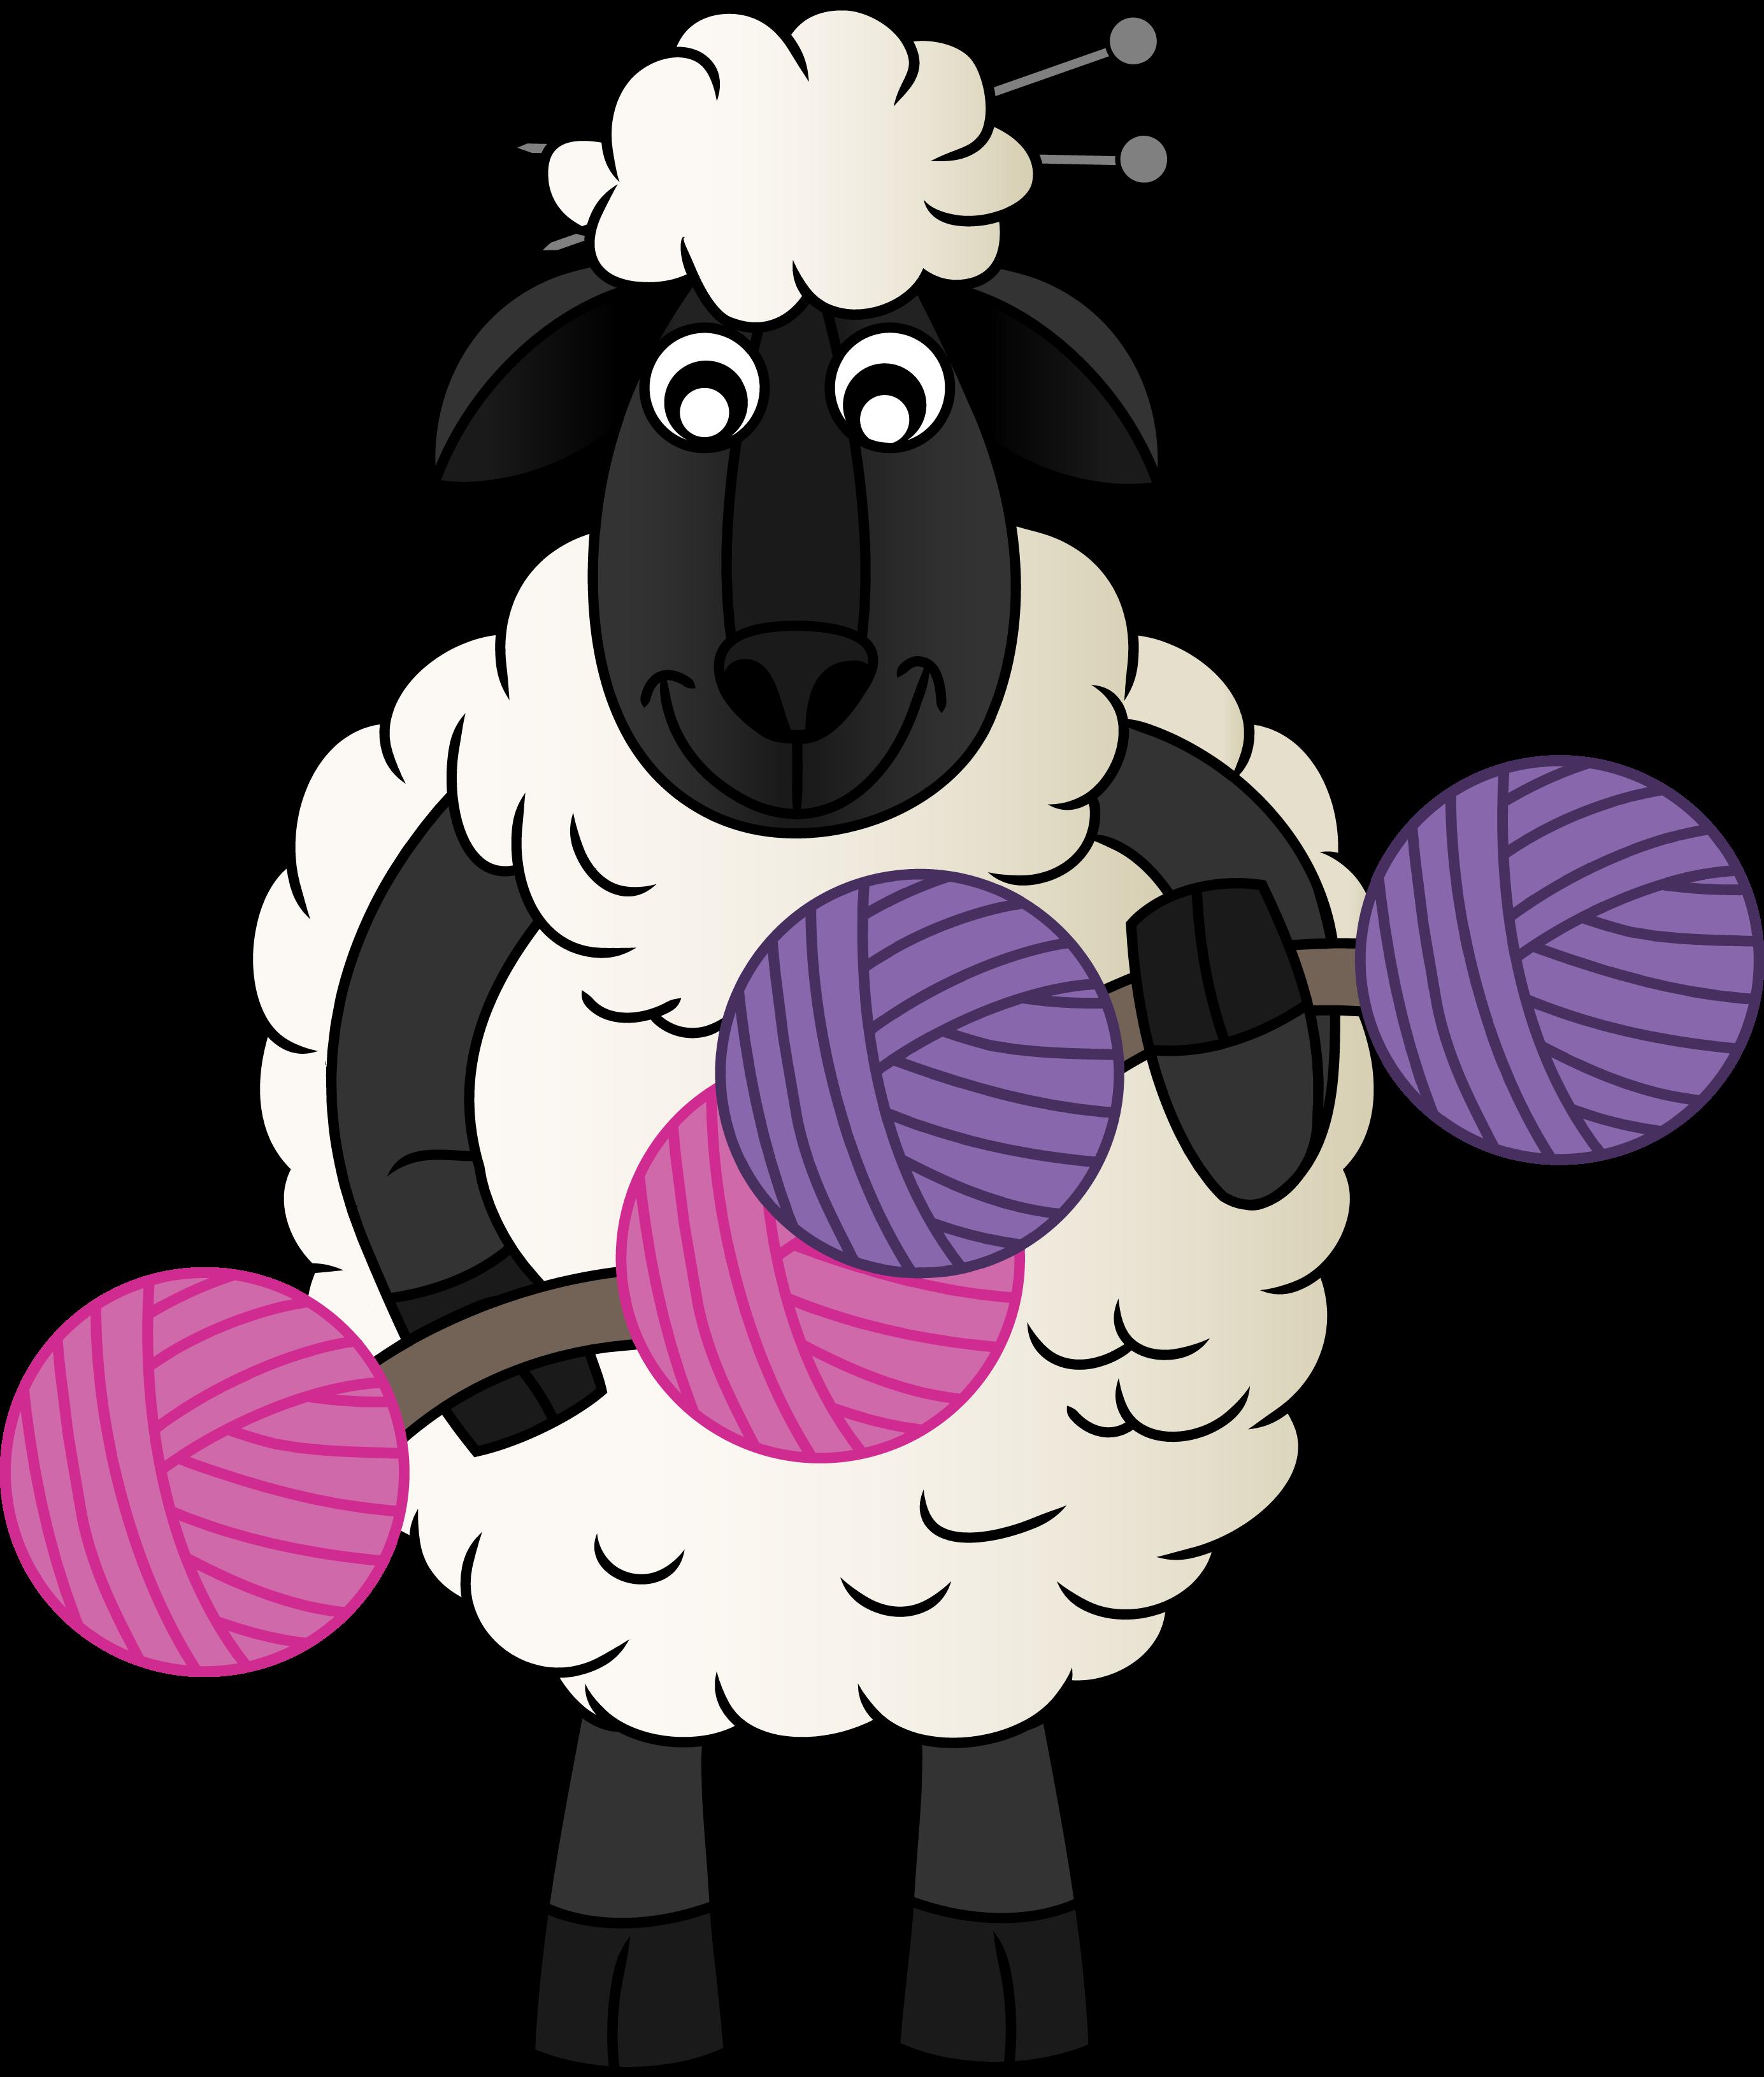 Clipart sheep knitting. Episode avila ridge knitical